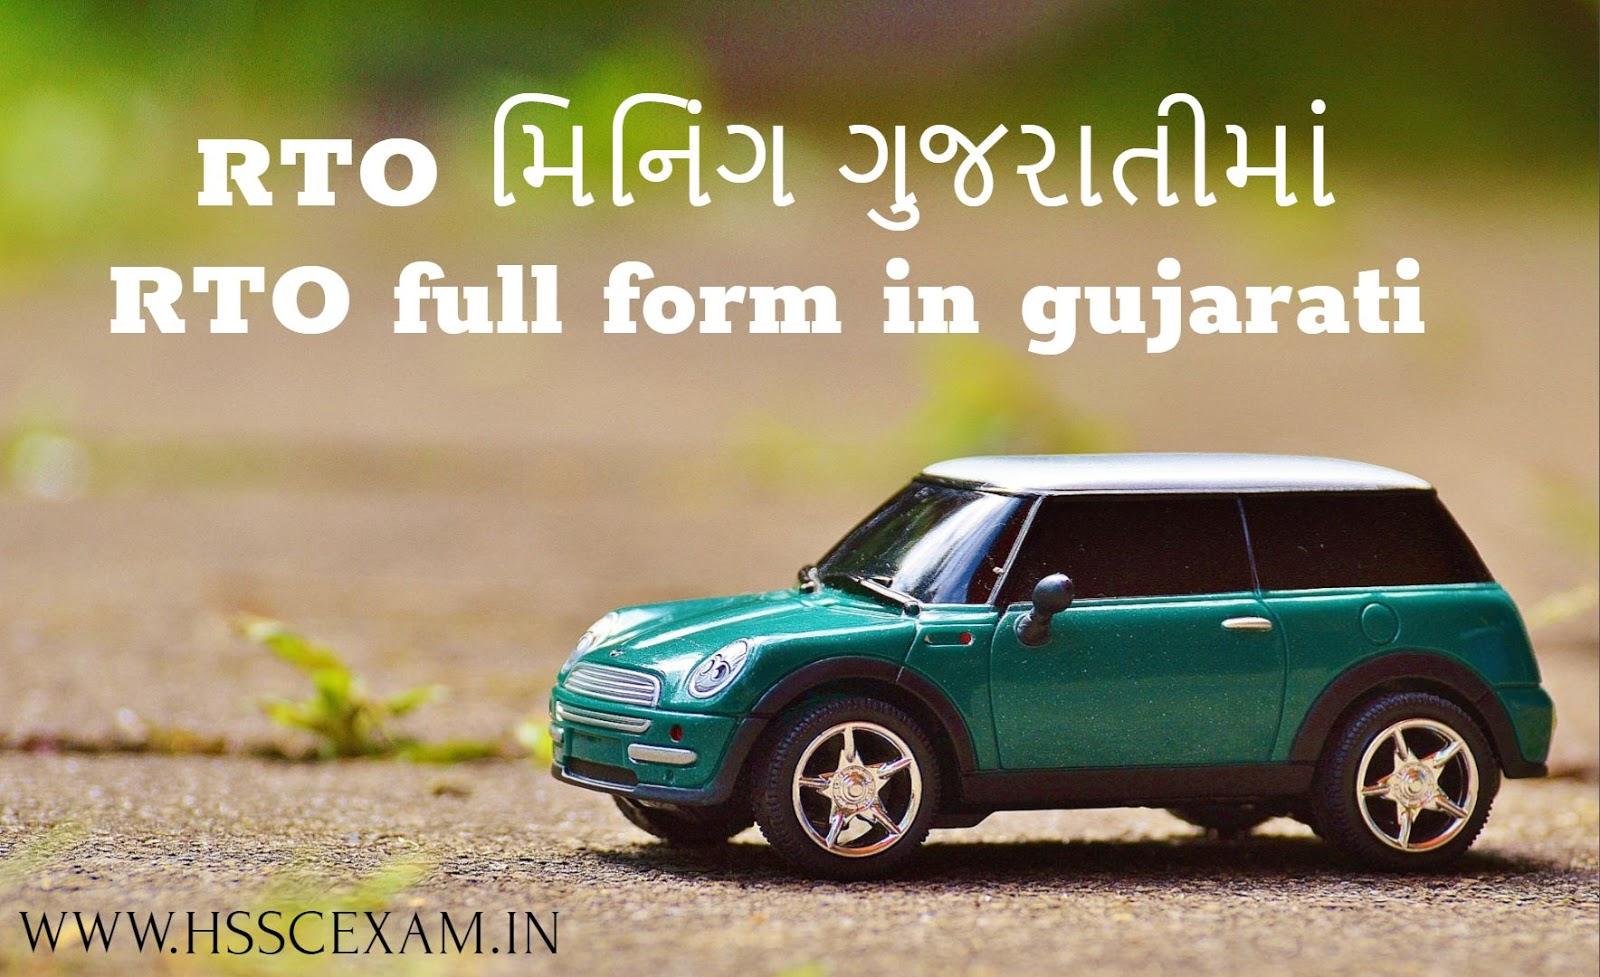 RTO full form in gujarati , RTO મિનિંગ ગુજરાતીમાં